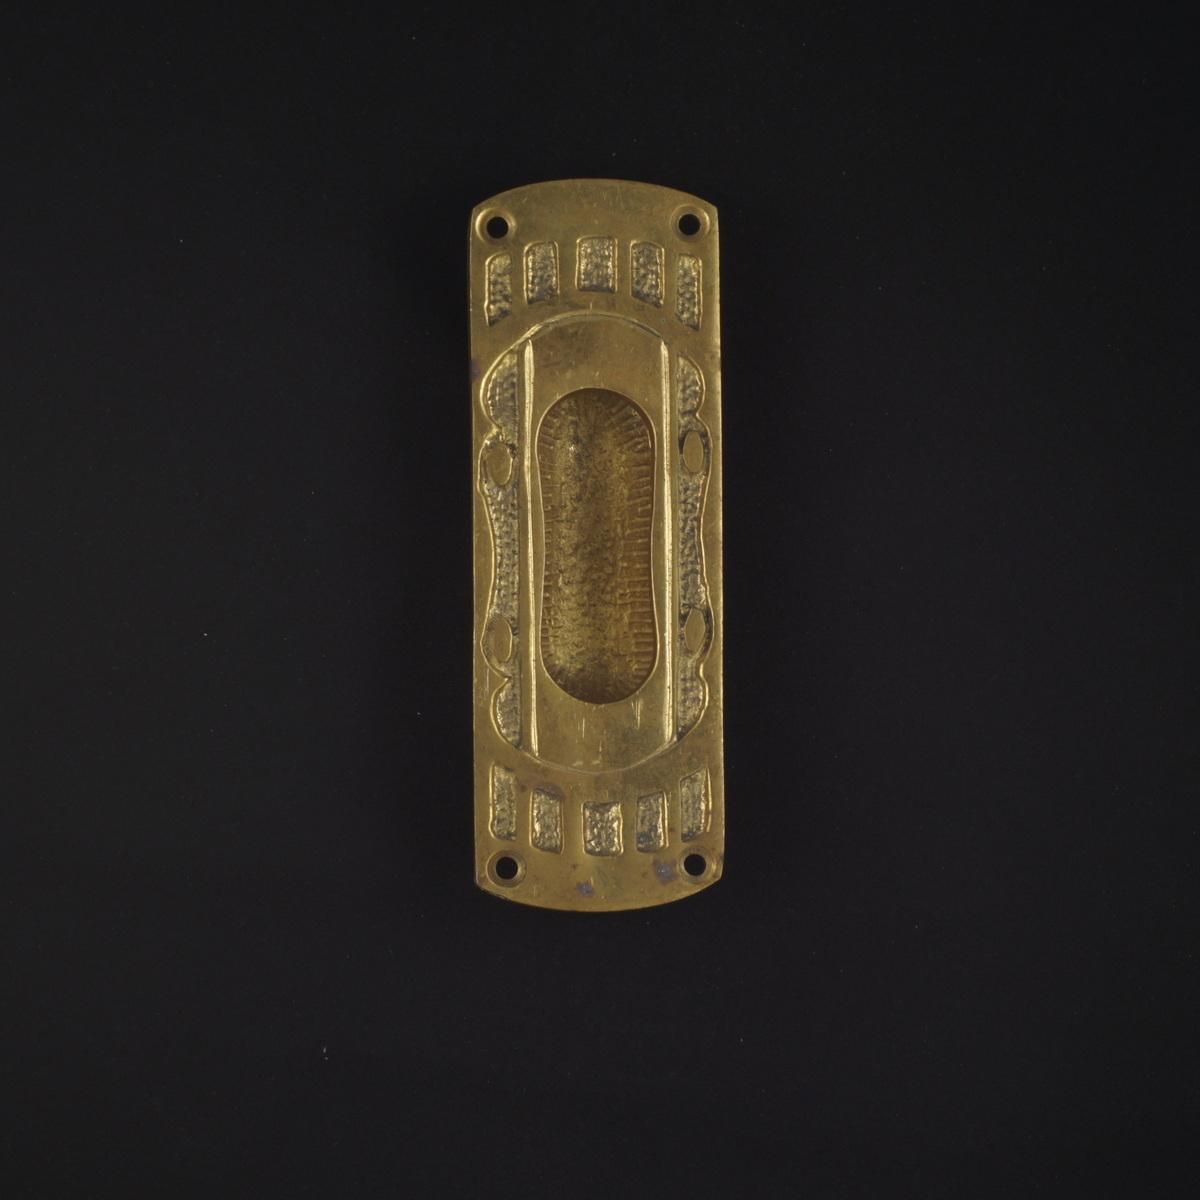 325.0004.35 Schiebetürmuschel - antike Türmuschel